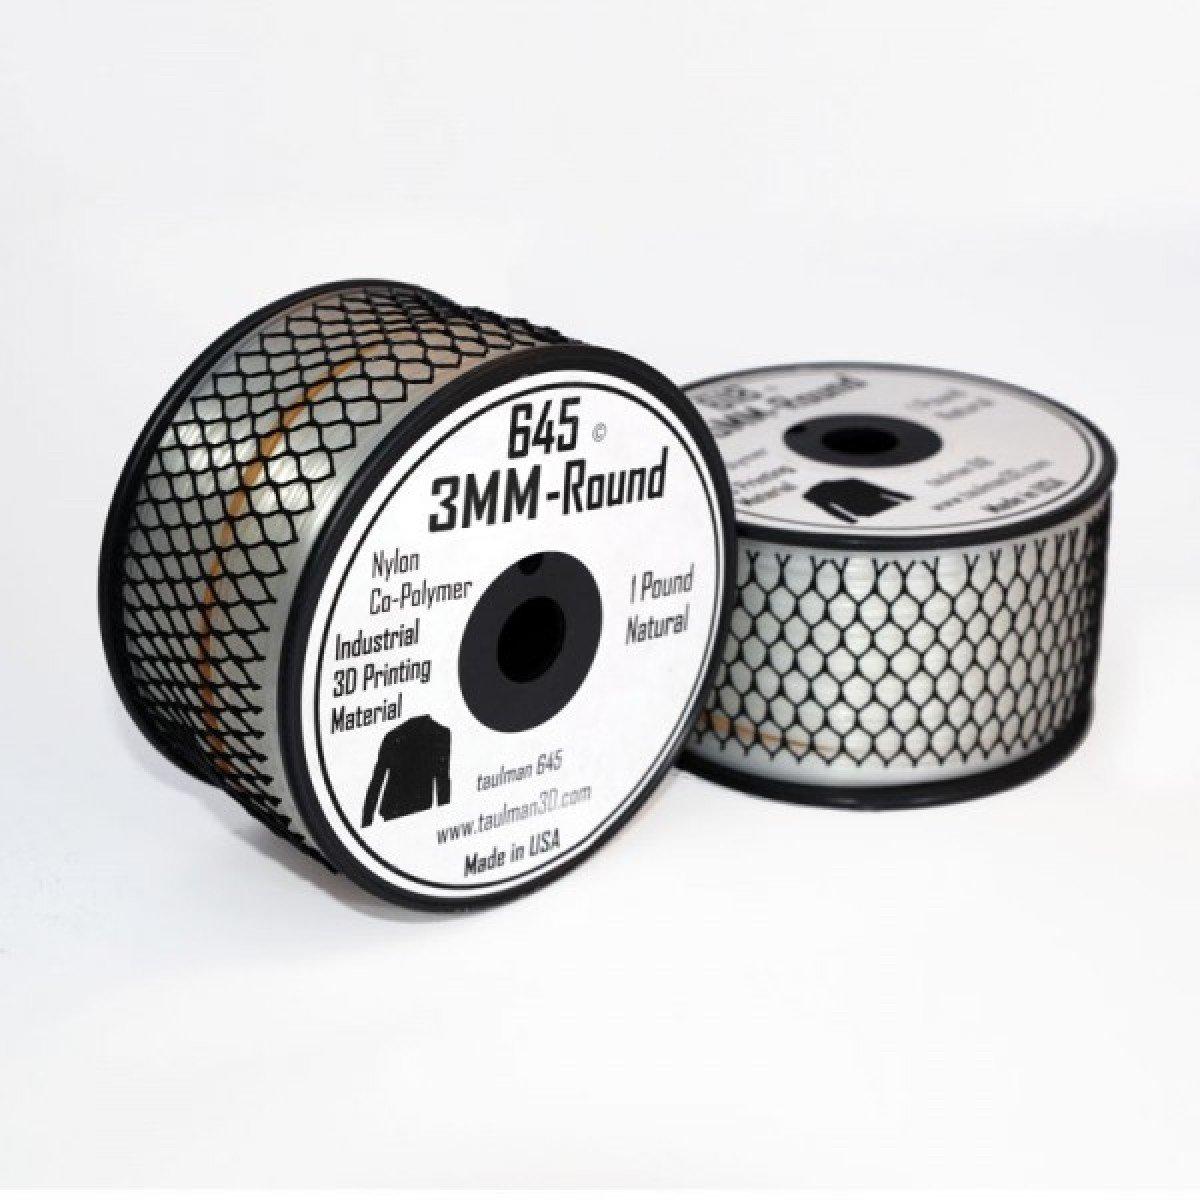 Taulman 645 Nylon 3 mm Filamento impresora 3d filamento para ...